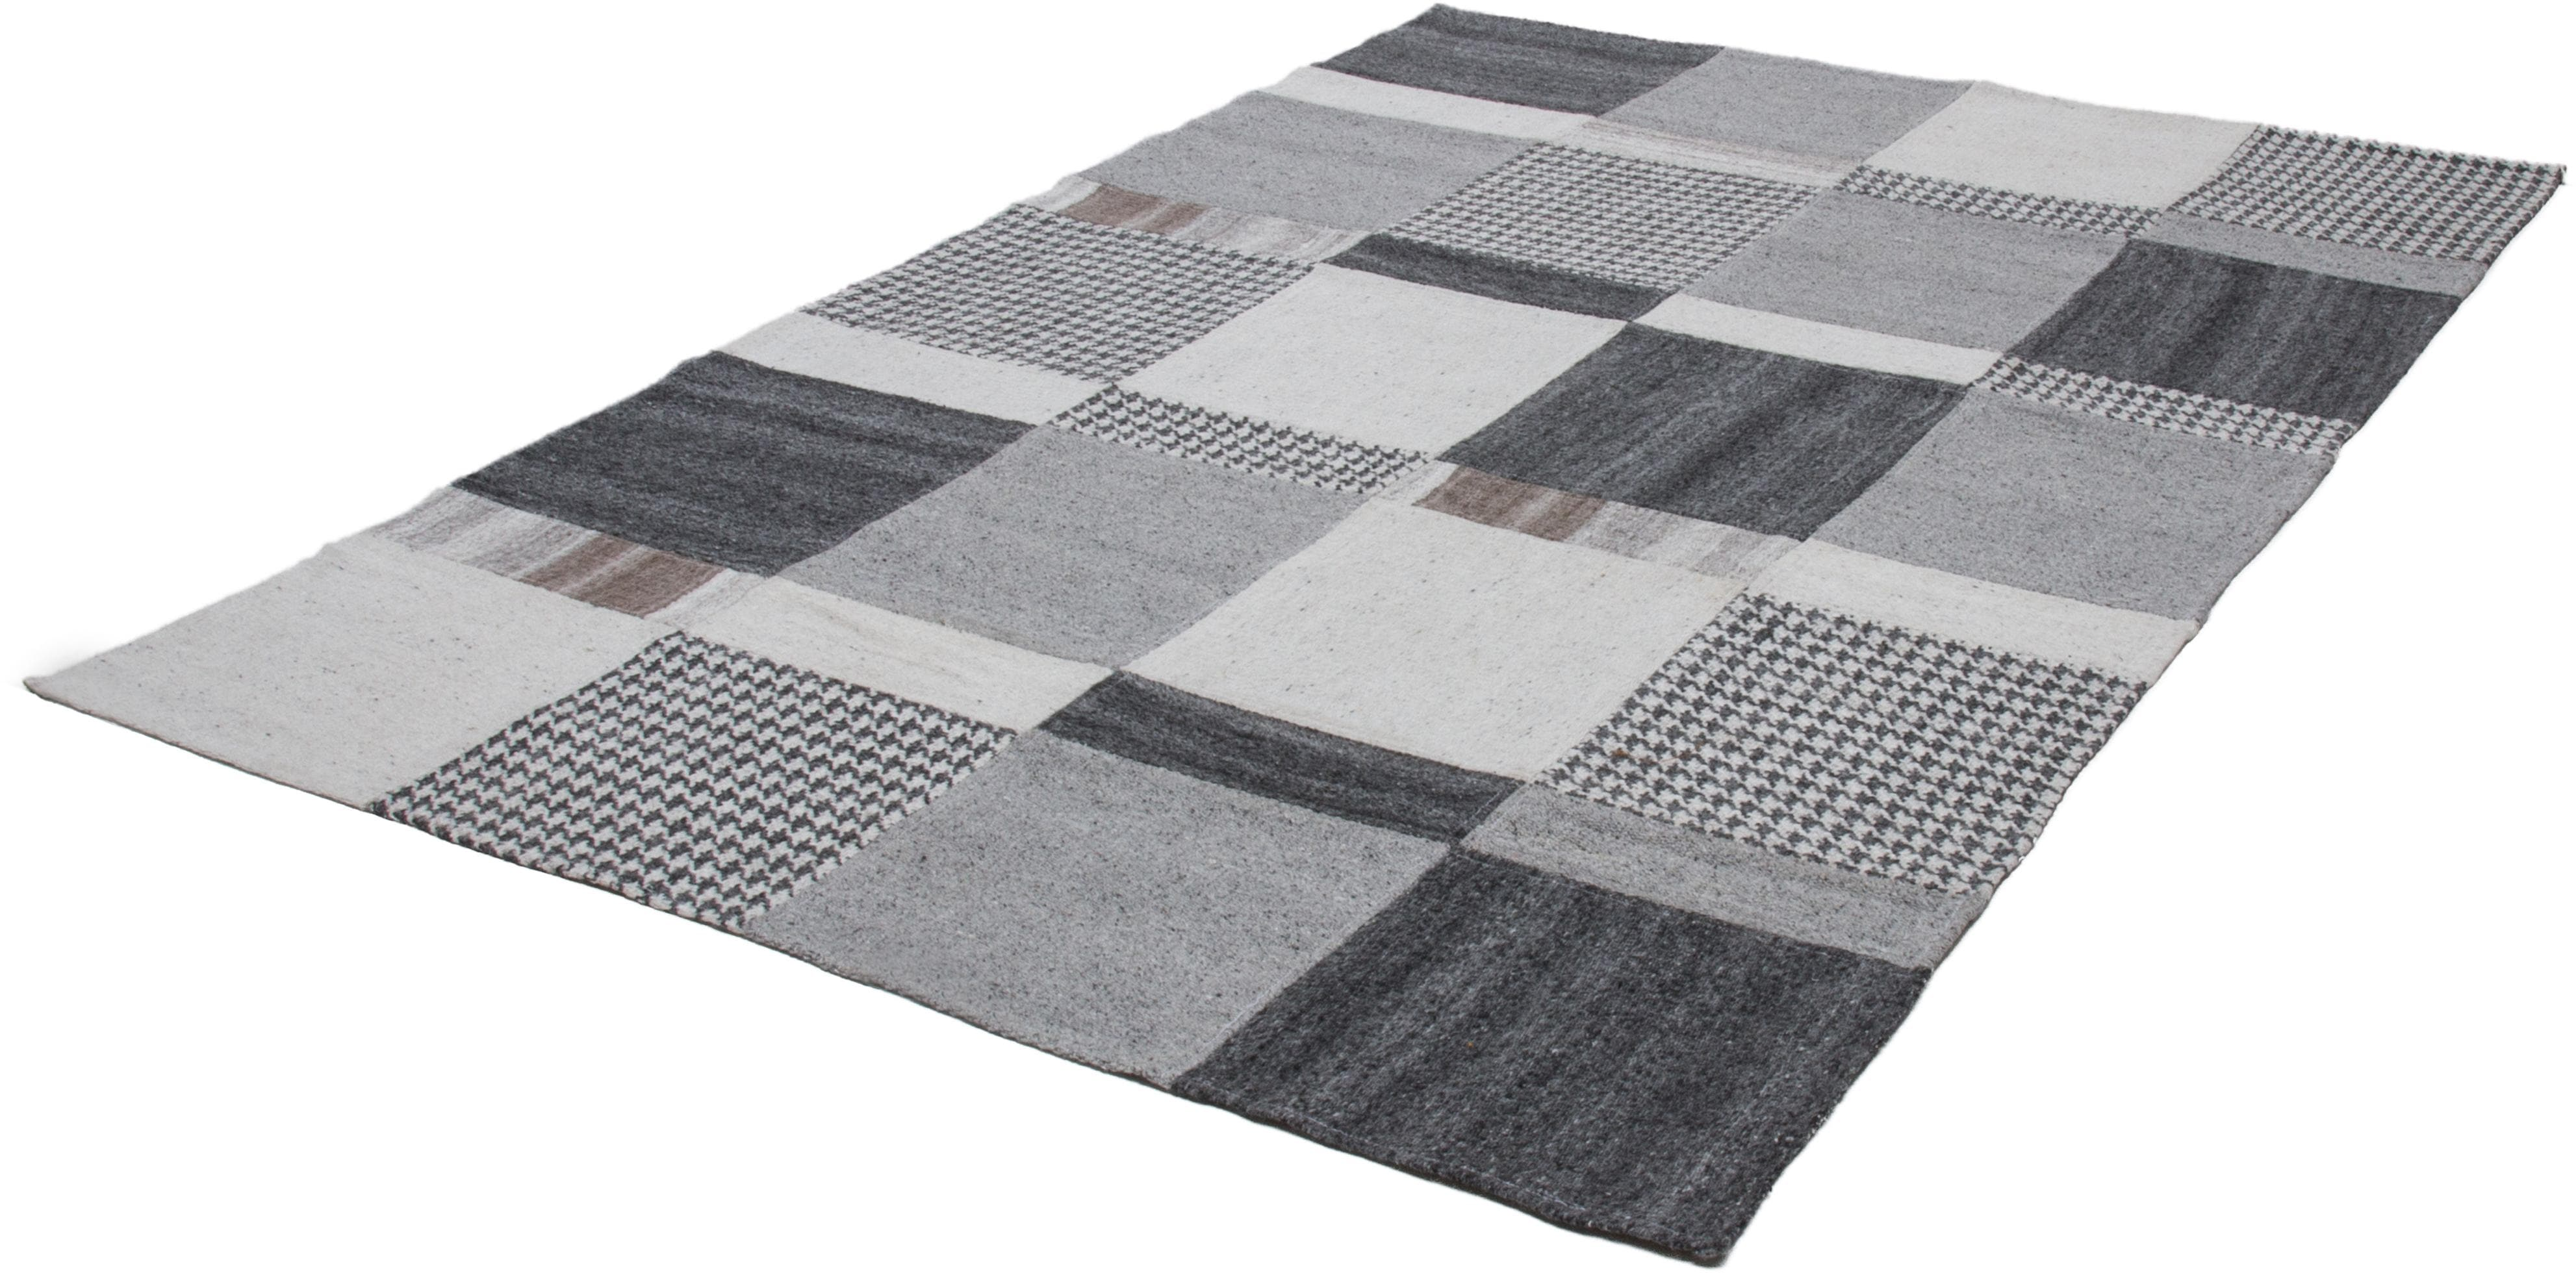 Teppich Liana 210 Kayoom rechteckig Höhe 6 mm handgewebt